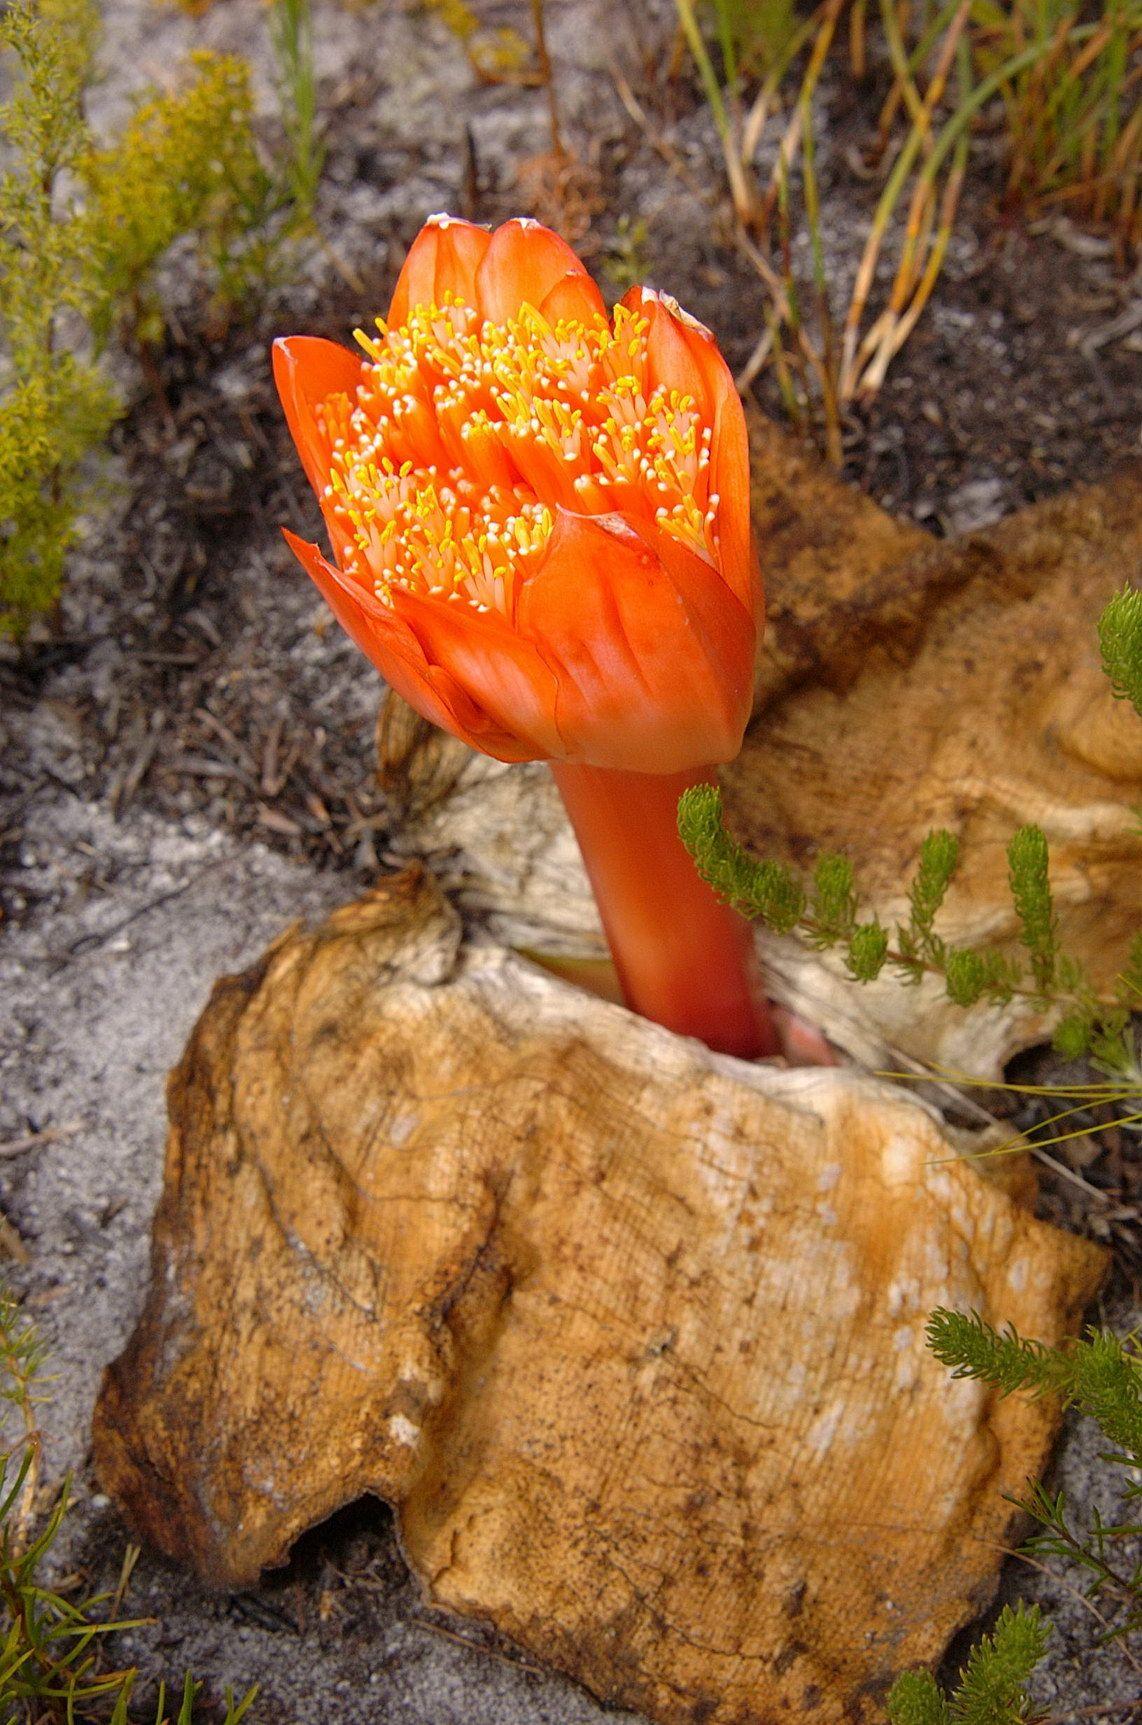 Sanginea coxineus common name April Fool flowers